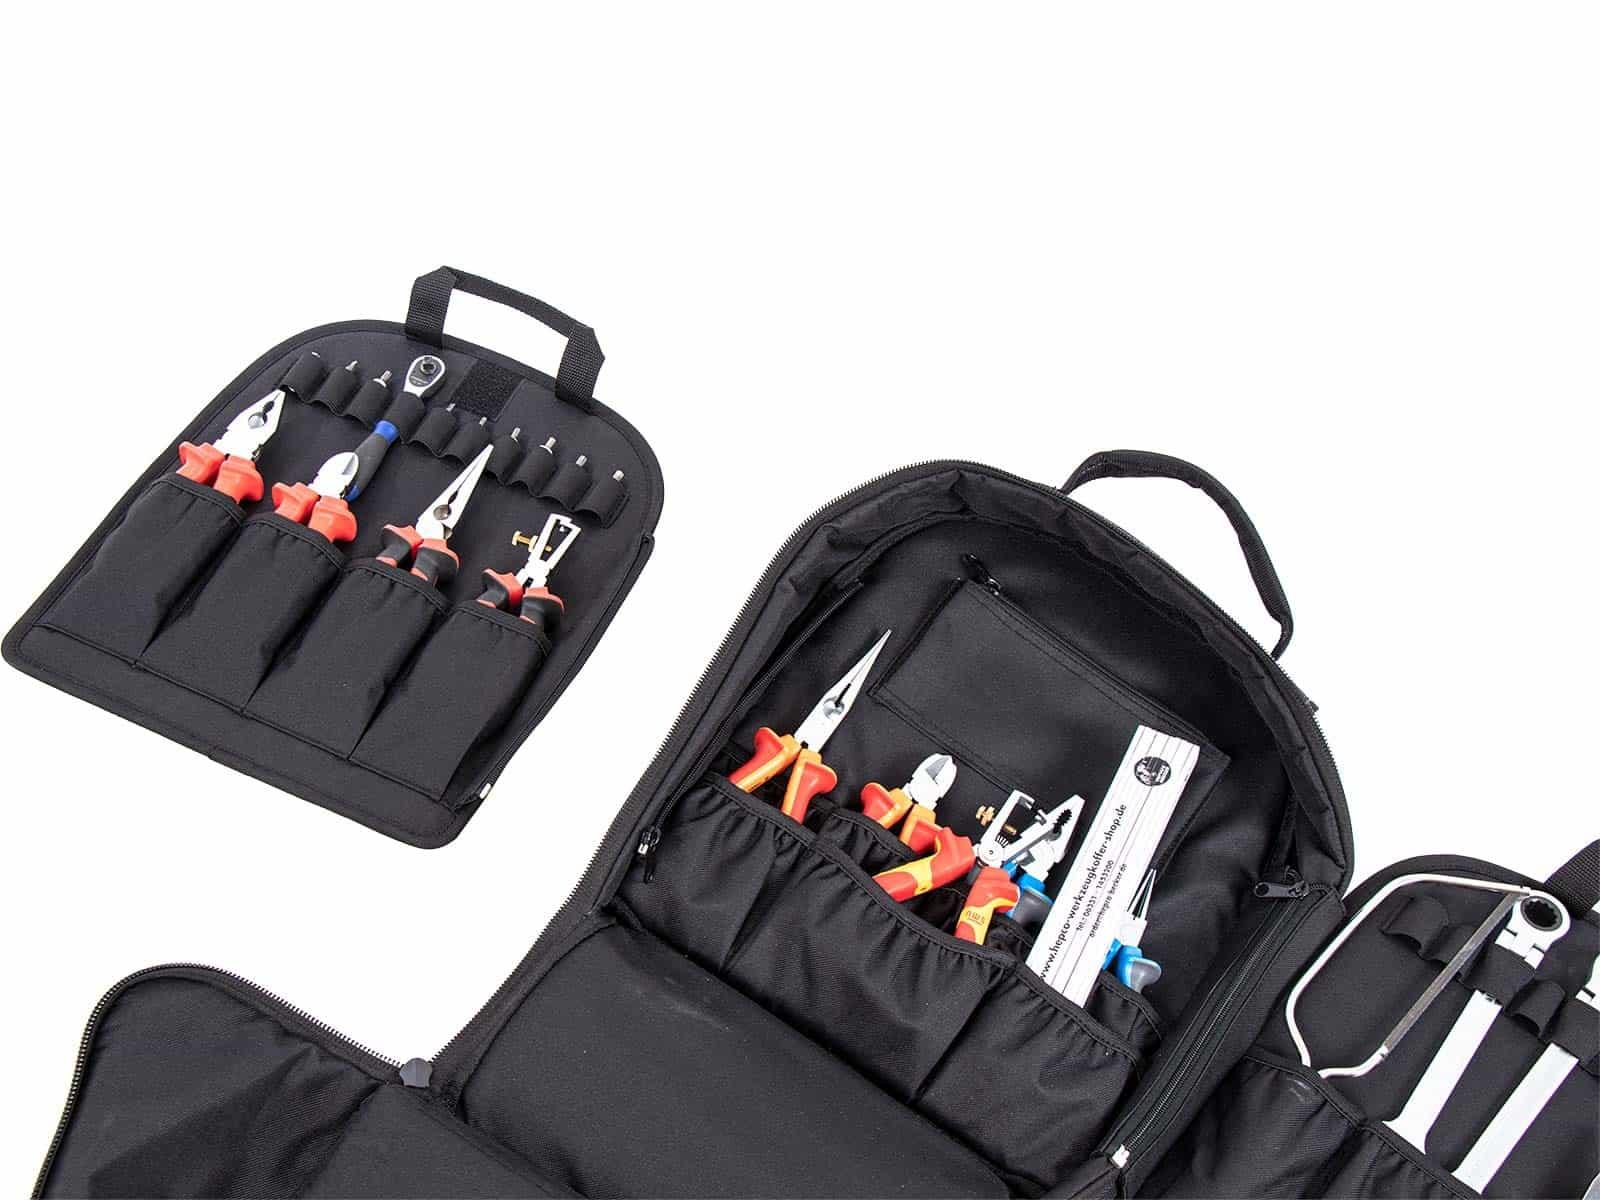 Techniker Werkzeugrucksack 5850